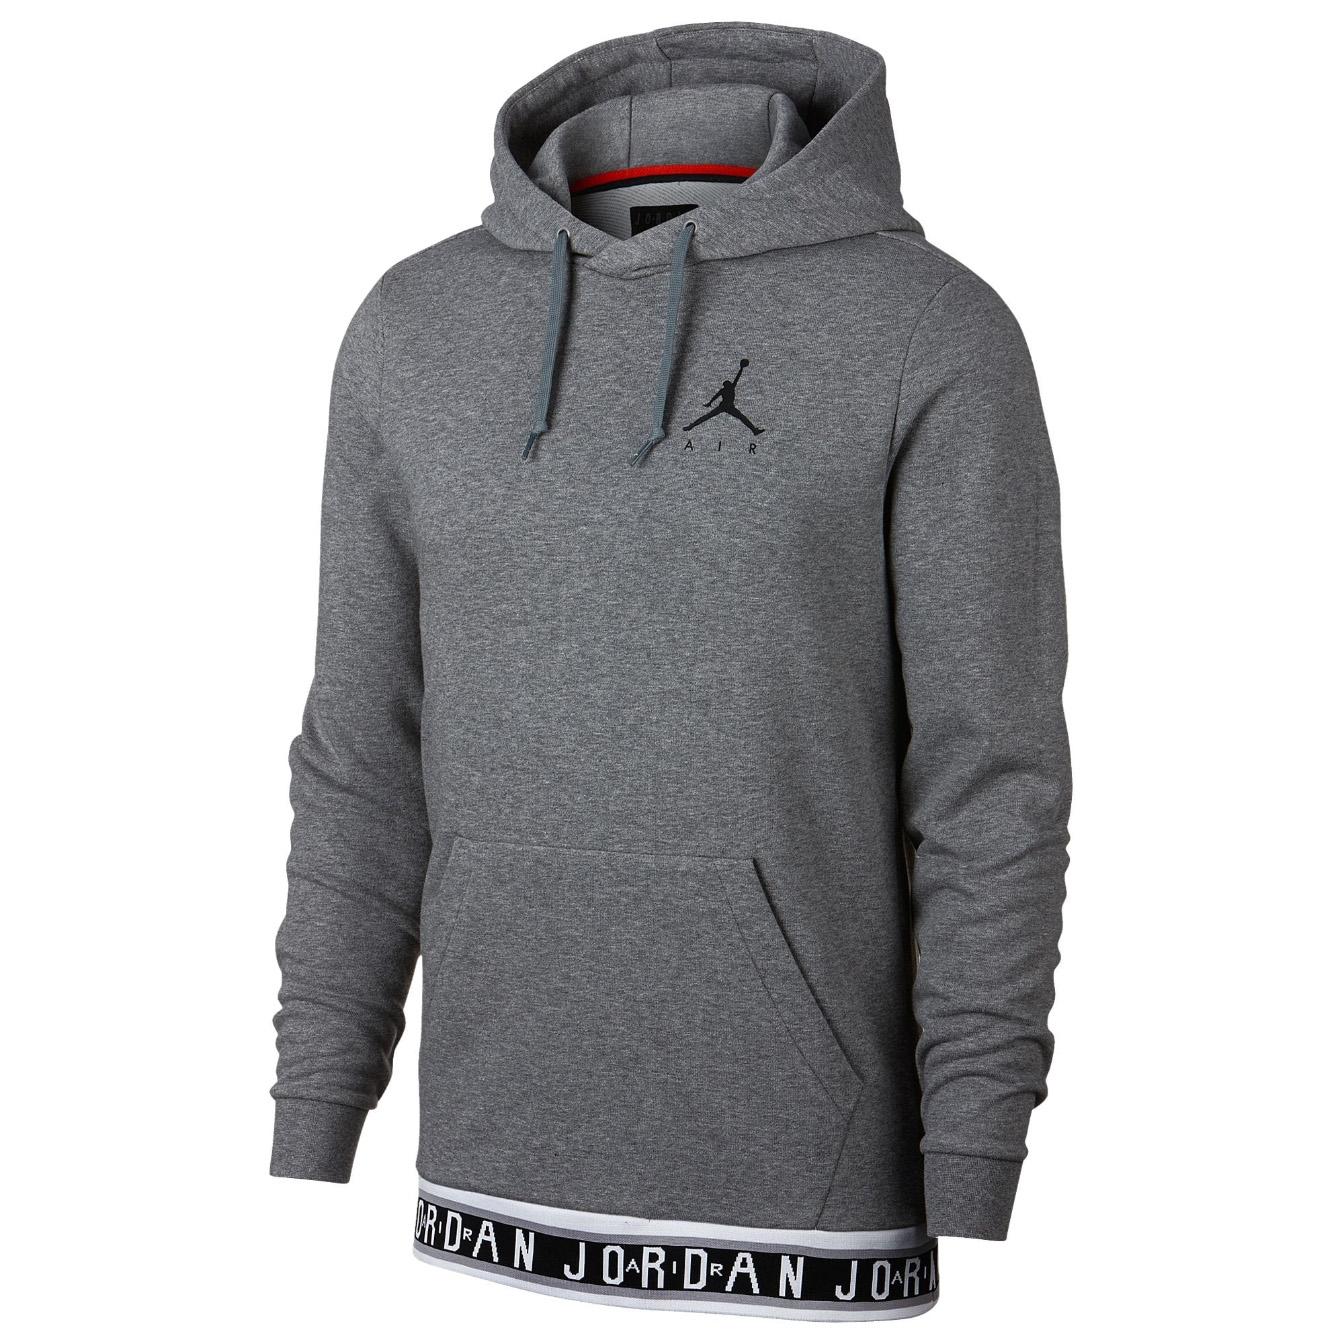 nouveau produit af21c 19eb1 Details about JORDAN Jumpman Air HBR Pull Over Hoodie Sweatshirt Sweat  Shirt jumper fleece